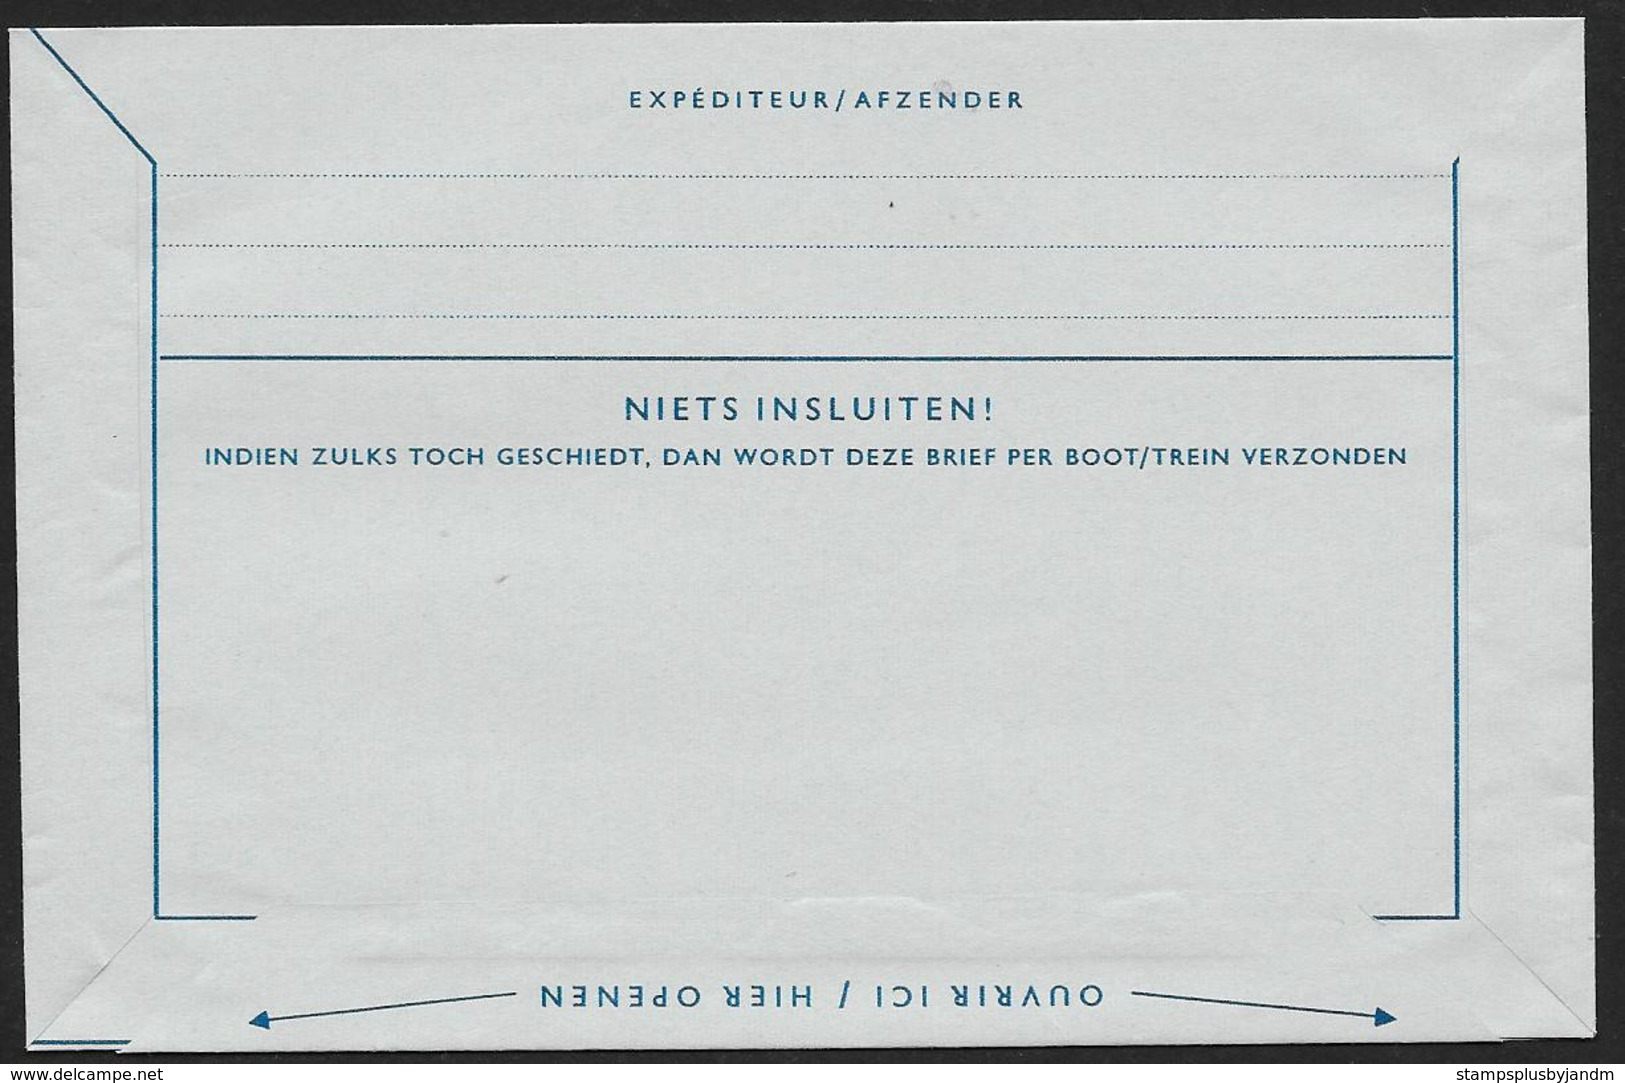 NETHERLANDS Aerogramme 30c Queen 1961 The Hague Cancel! STK#X21238 - Postal Stationery